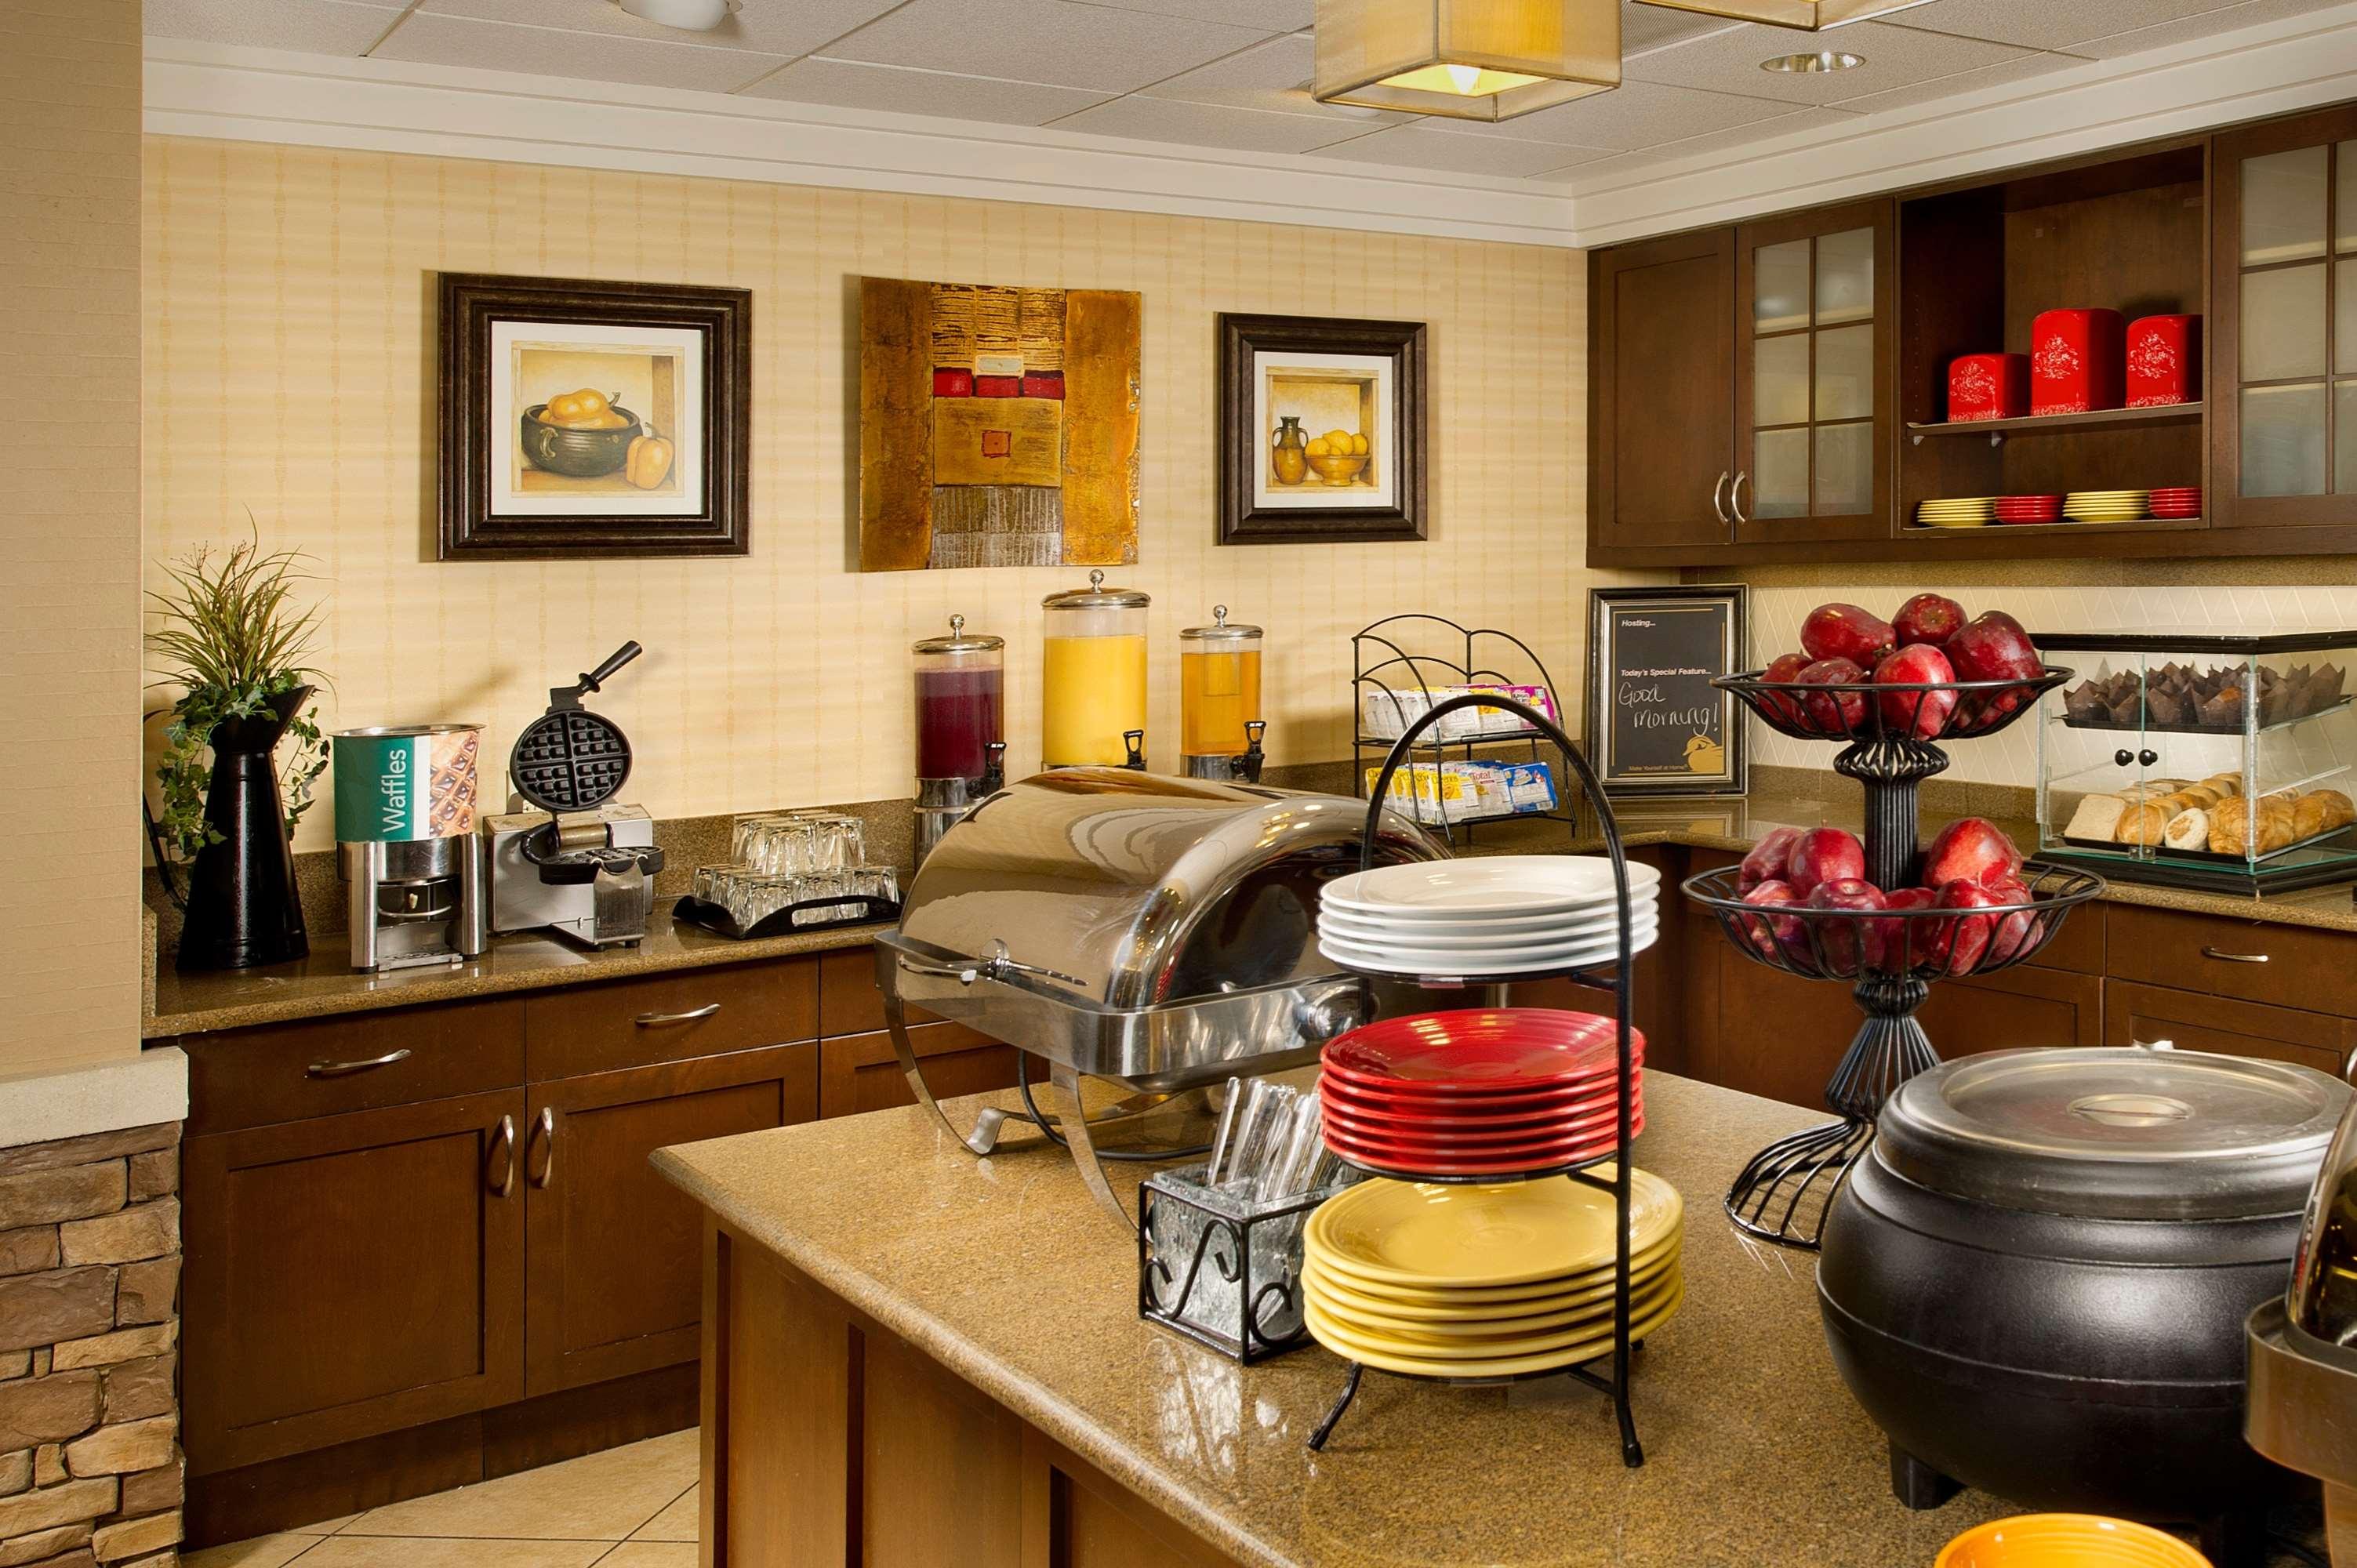 Homewood Suites by Hilton Columbus image 10